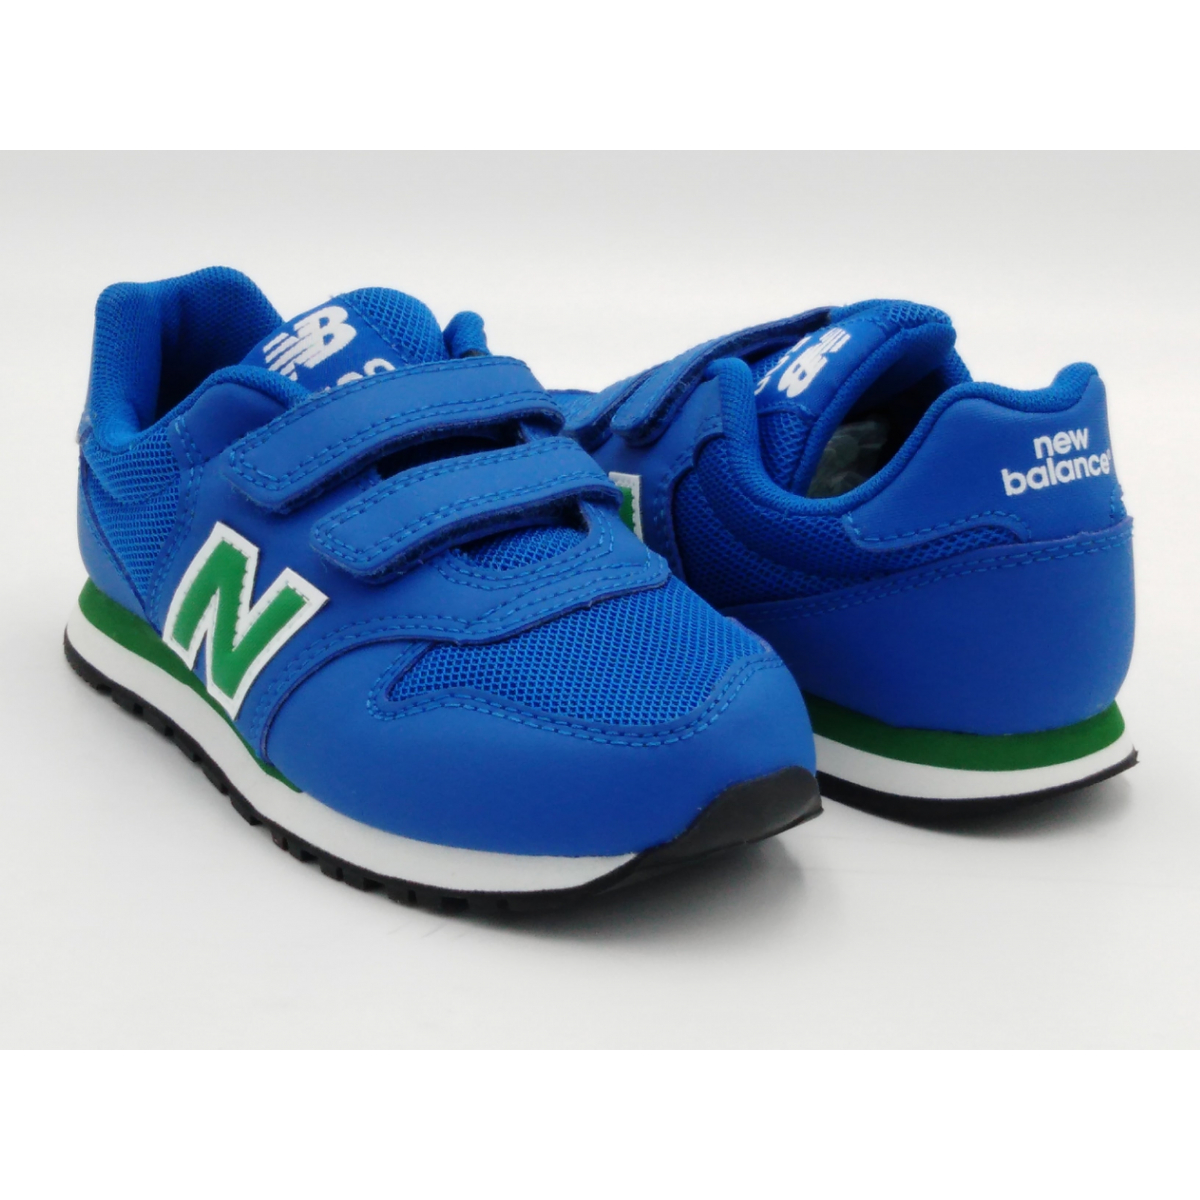 New Balance 500 -Sneaker...